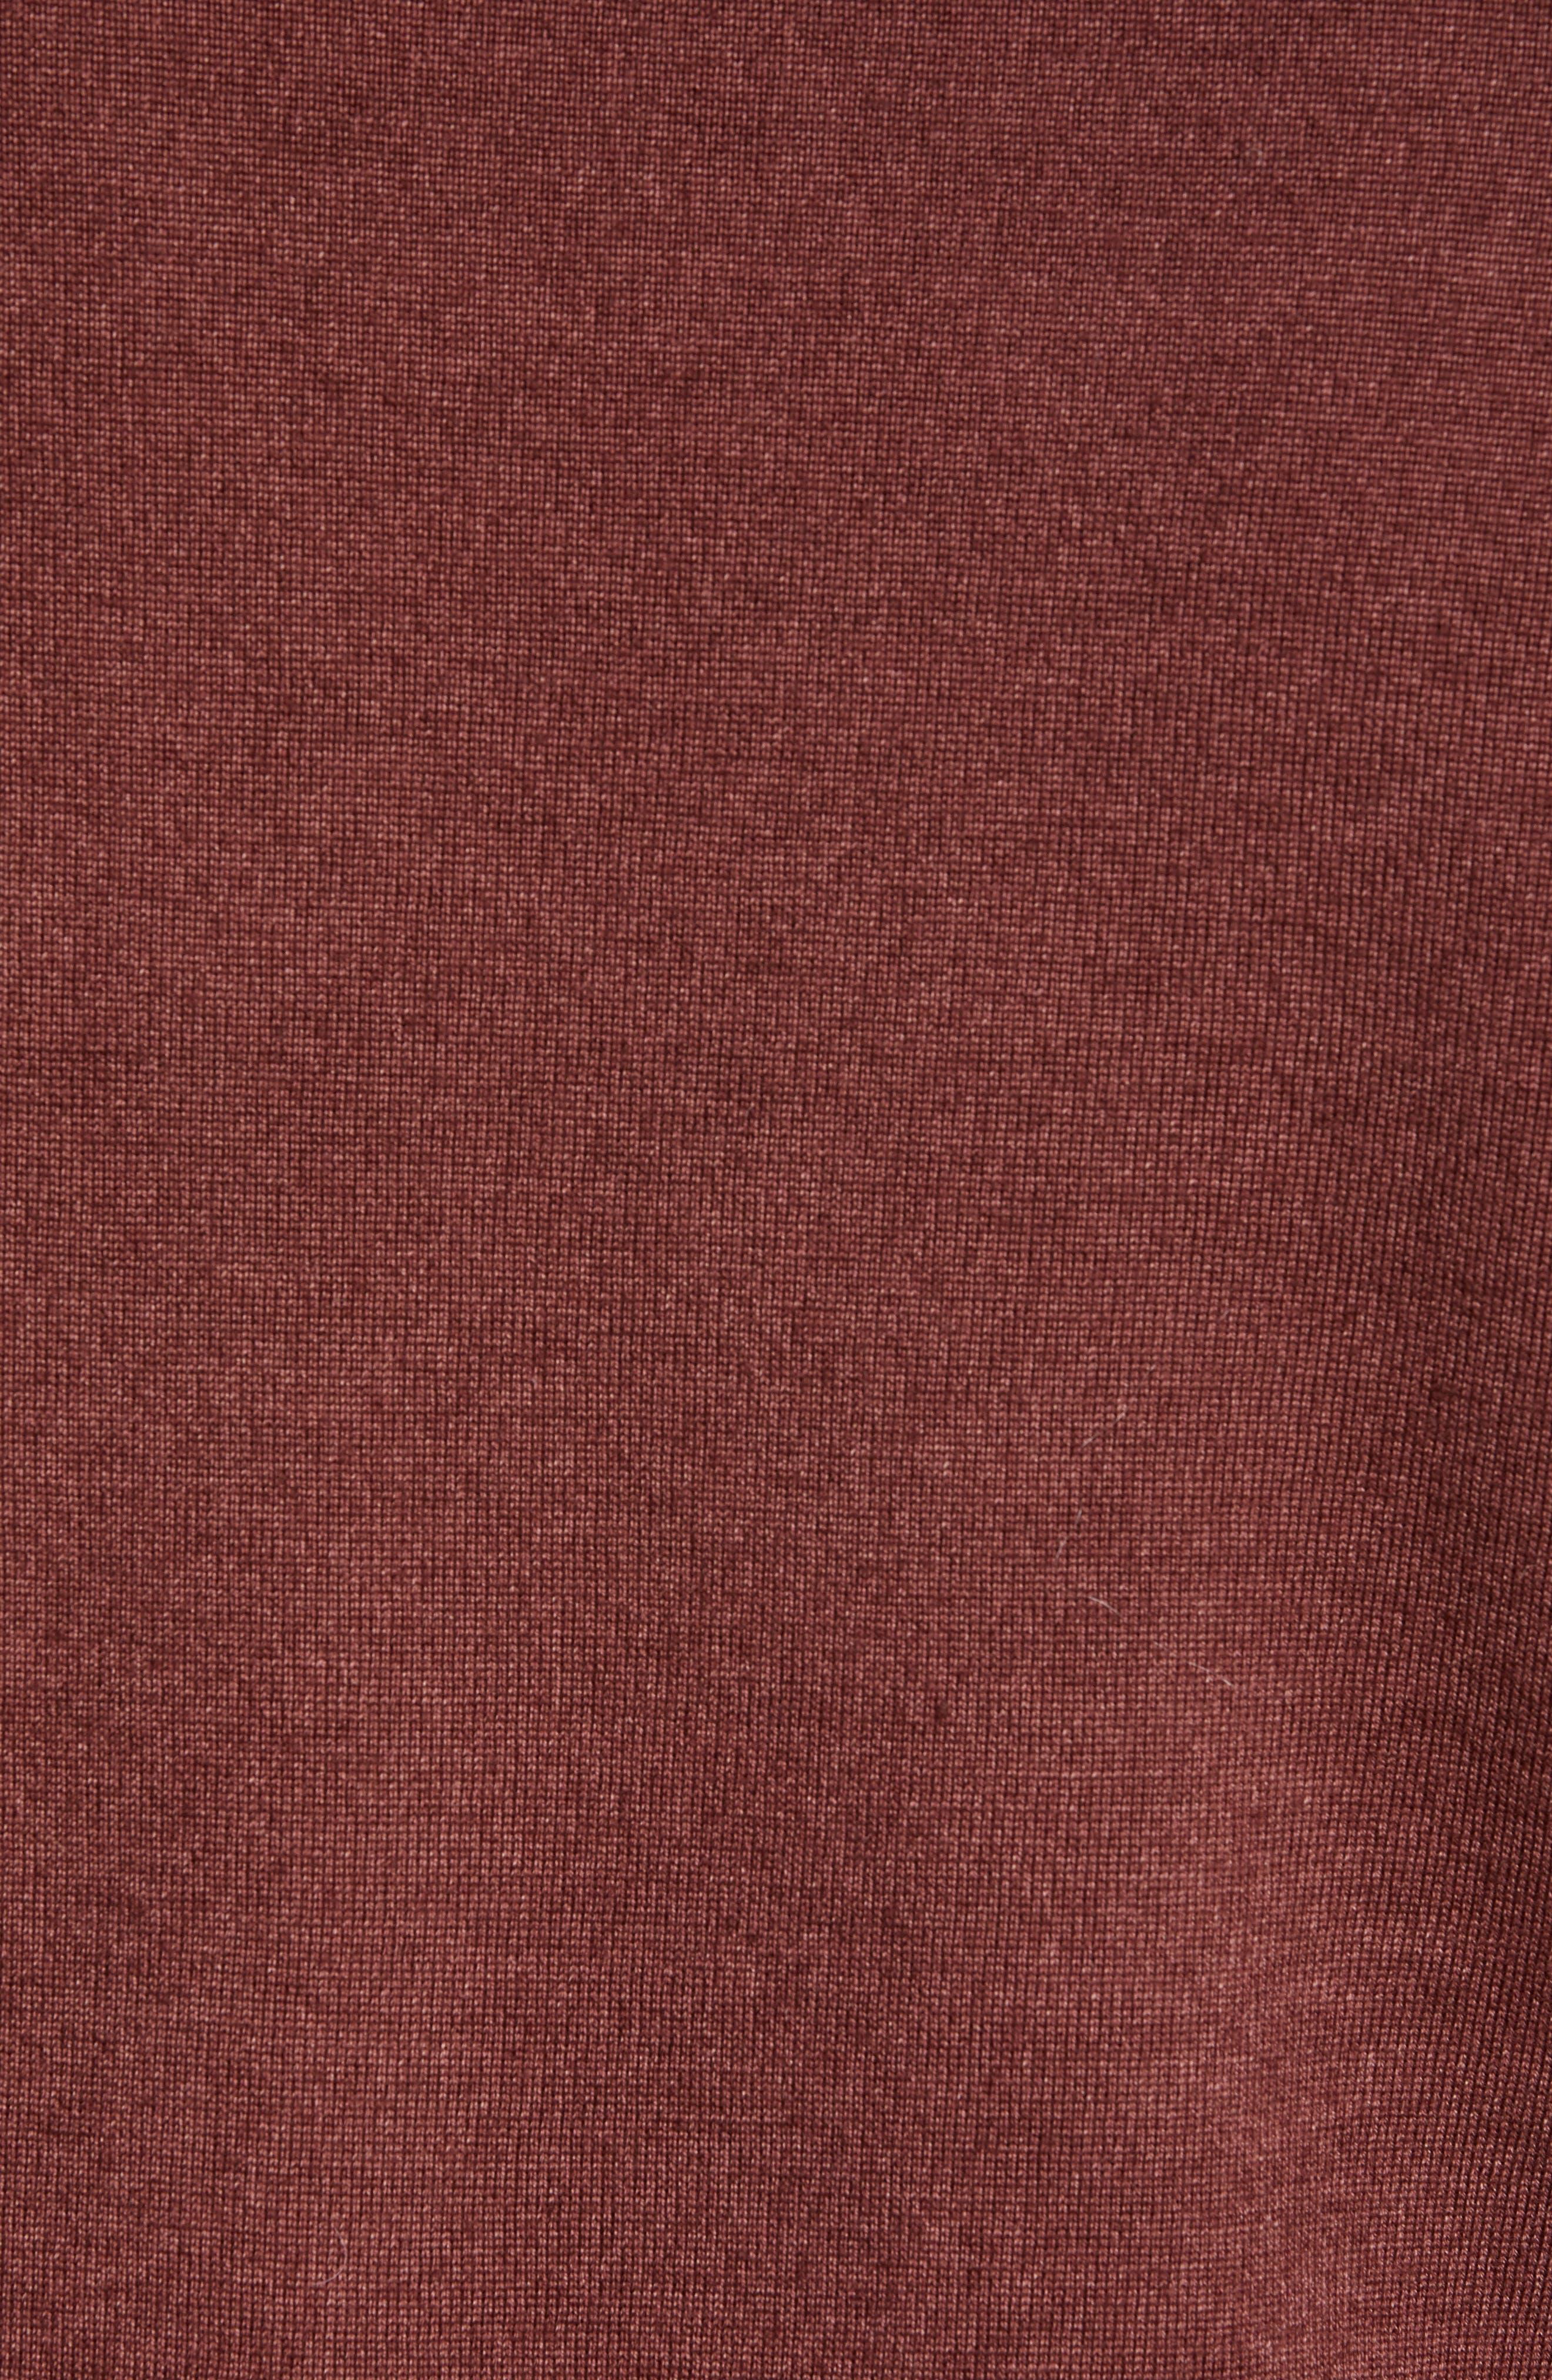 Trim Fit Newab Garment Dyed Wool Sweater,                             Alternate thumbnail 5, color,                             MAROON